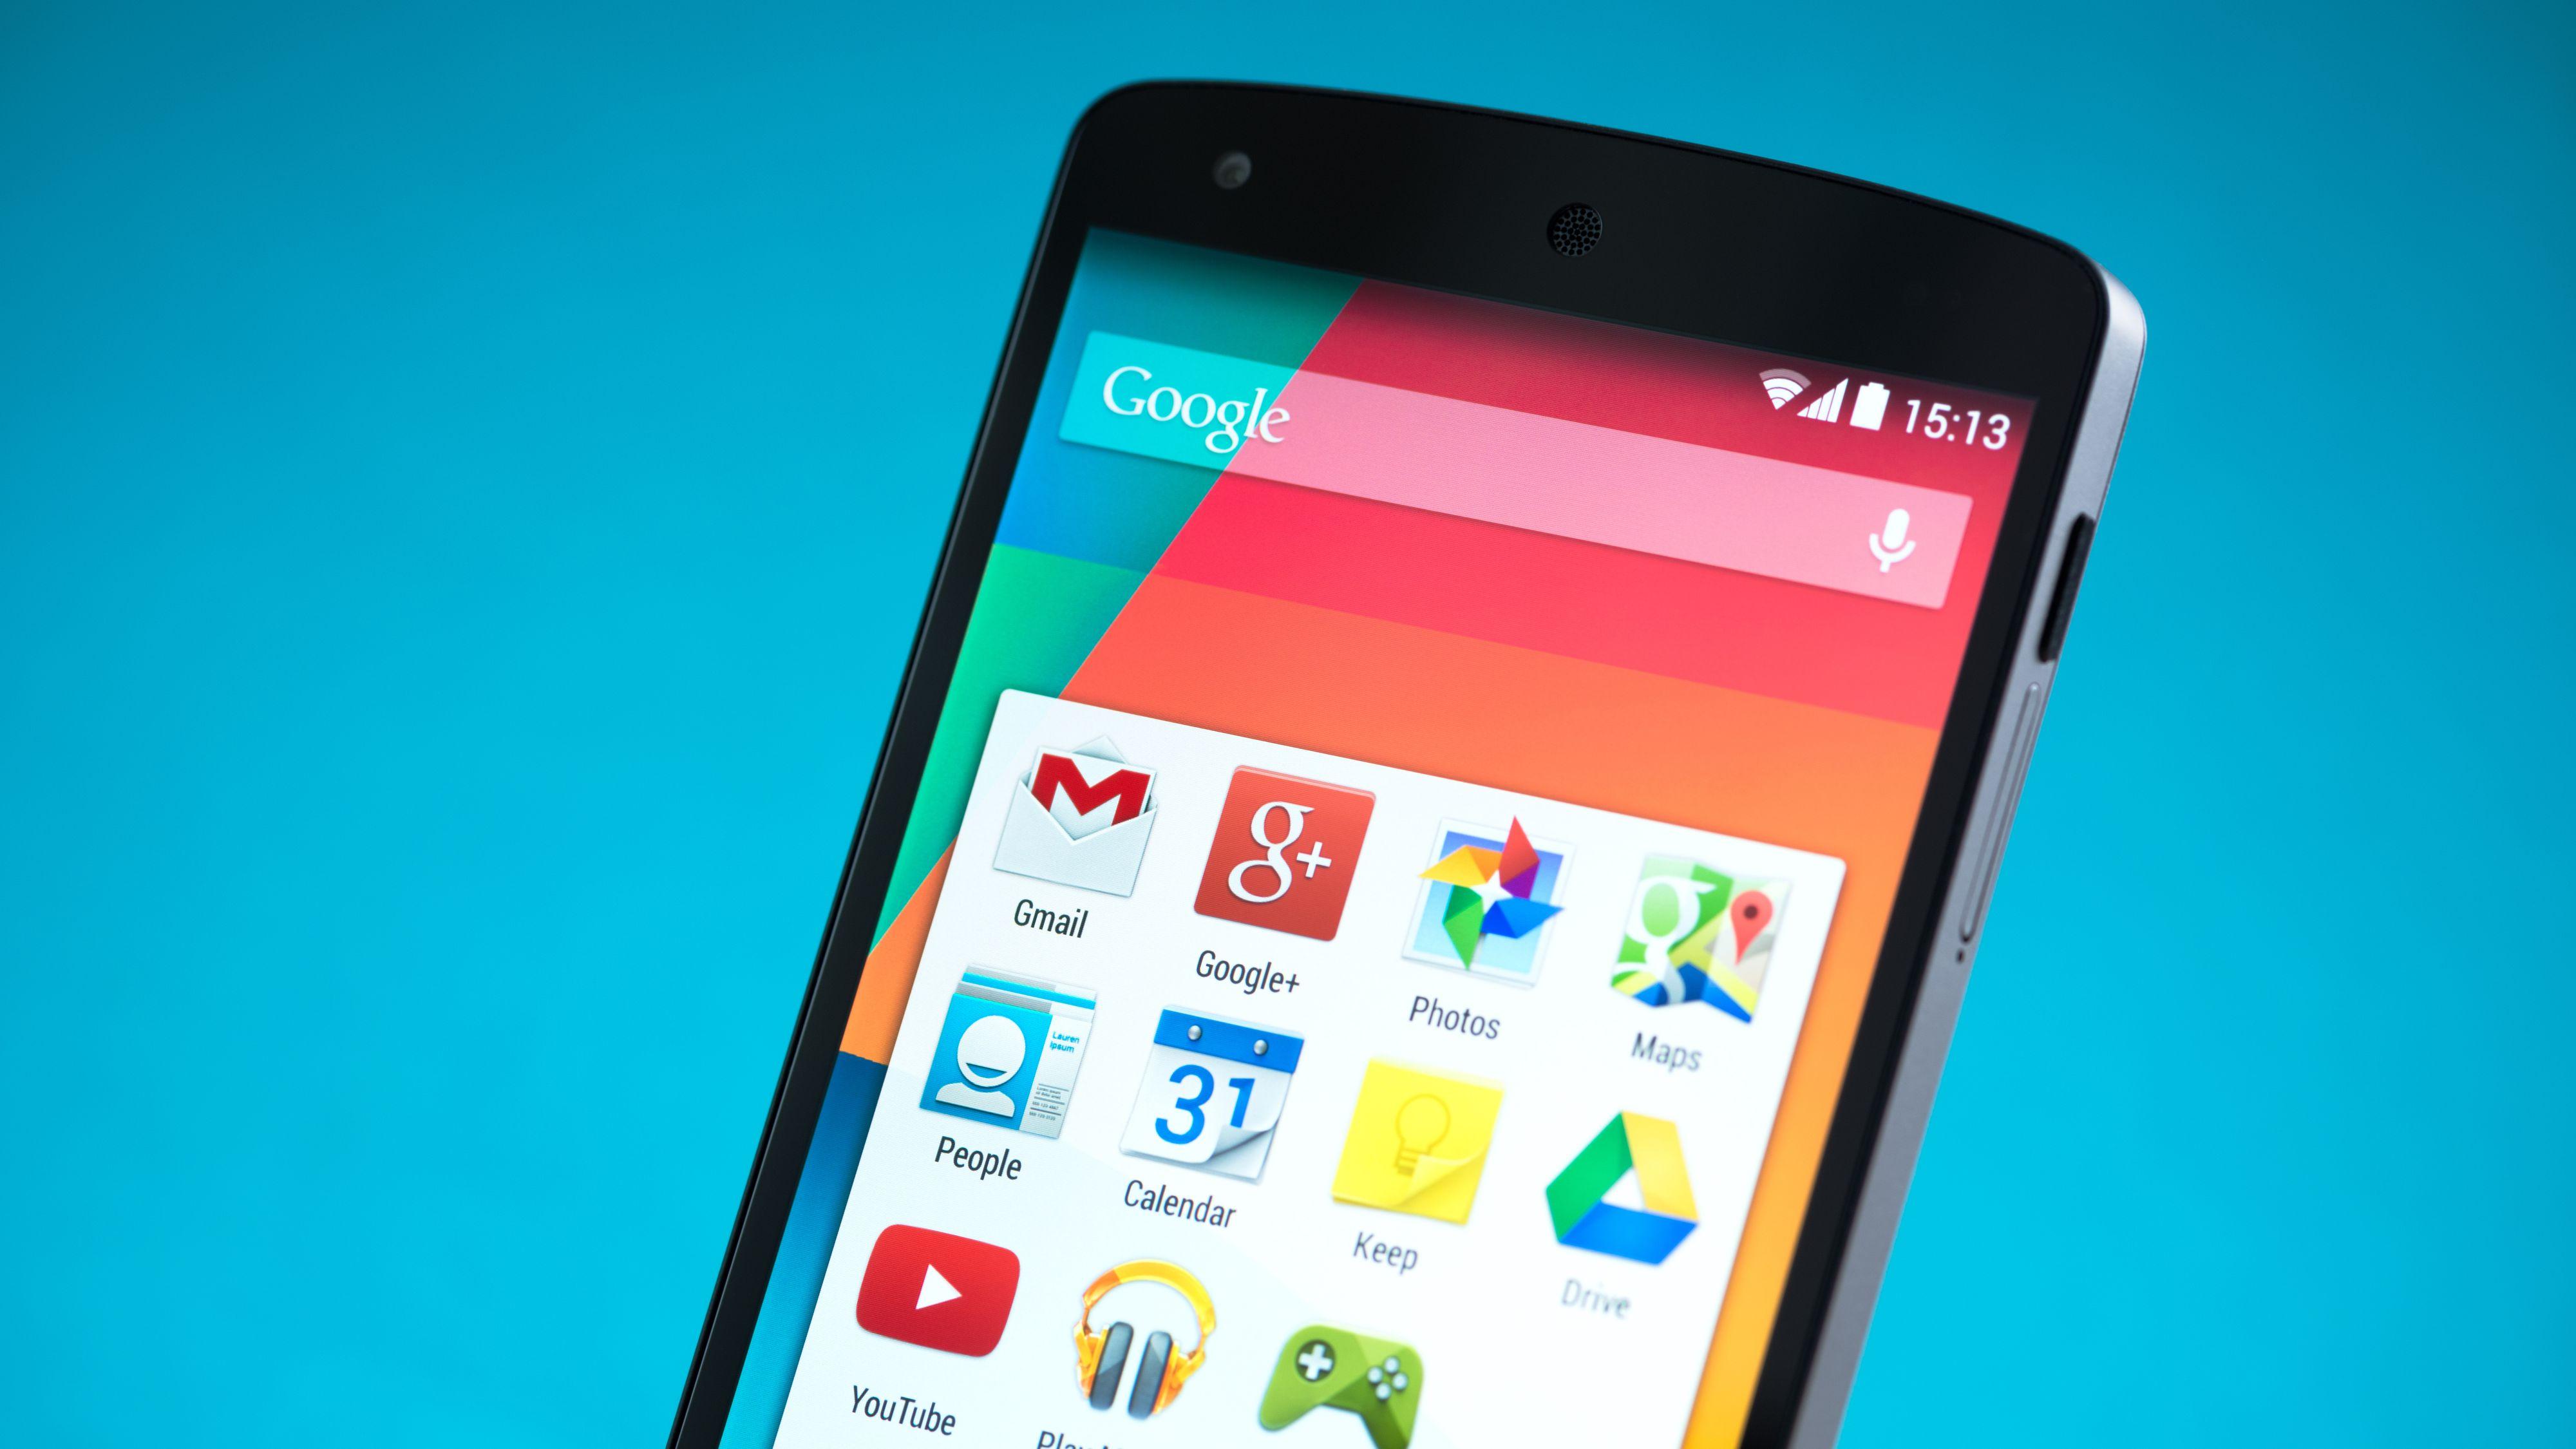 Google-appen på mobil har fått sin egen «personlige» nyhetsstrøm